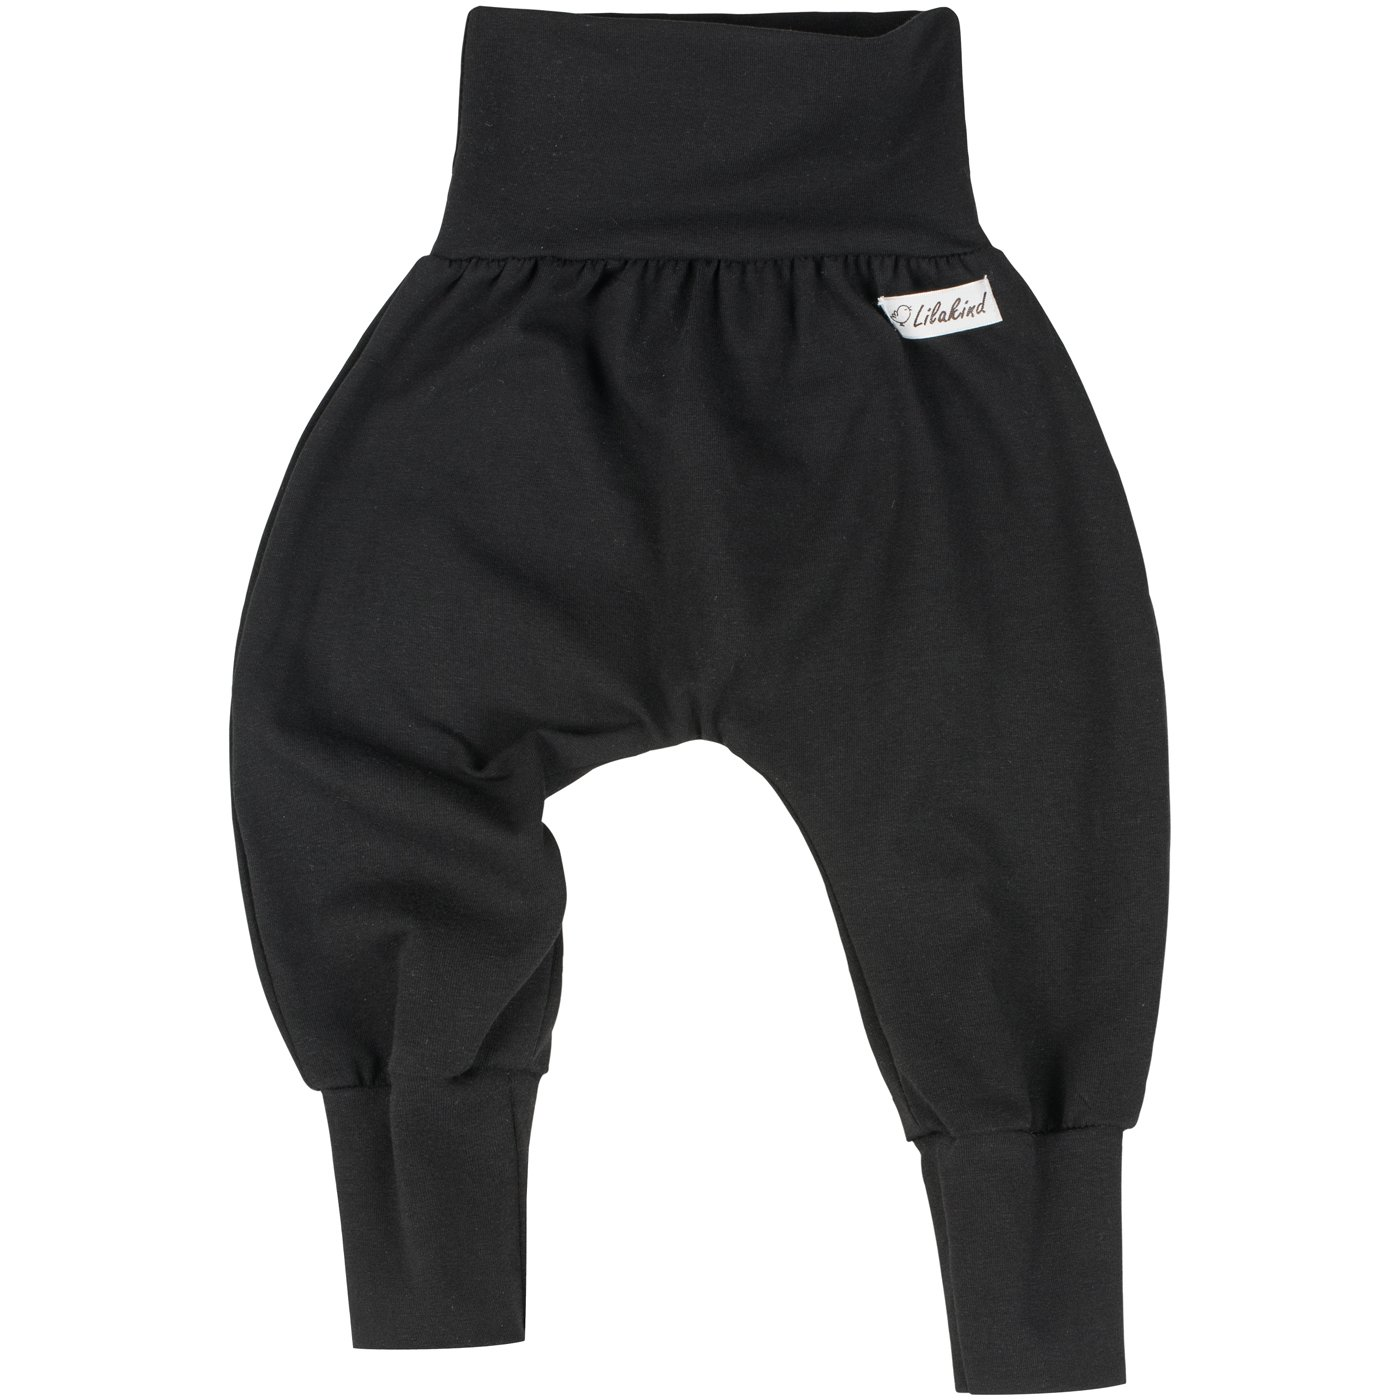 50//56-86//92 Lilakind Pumphose Hose Babyhose Stretchhose Uni Einfarbig Schwarz Gr Made in Germany